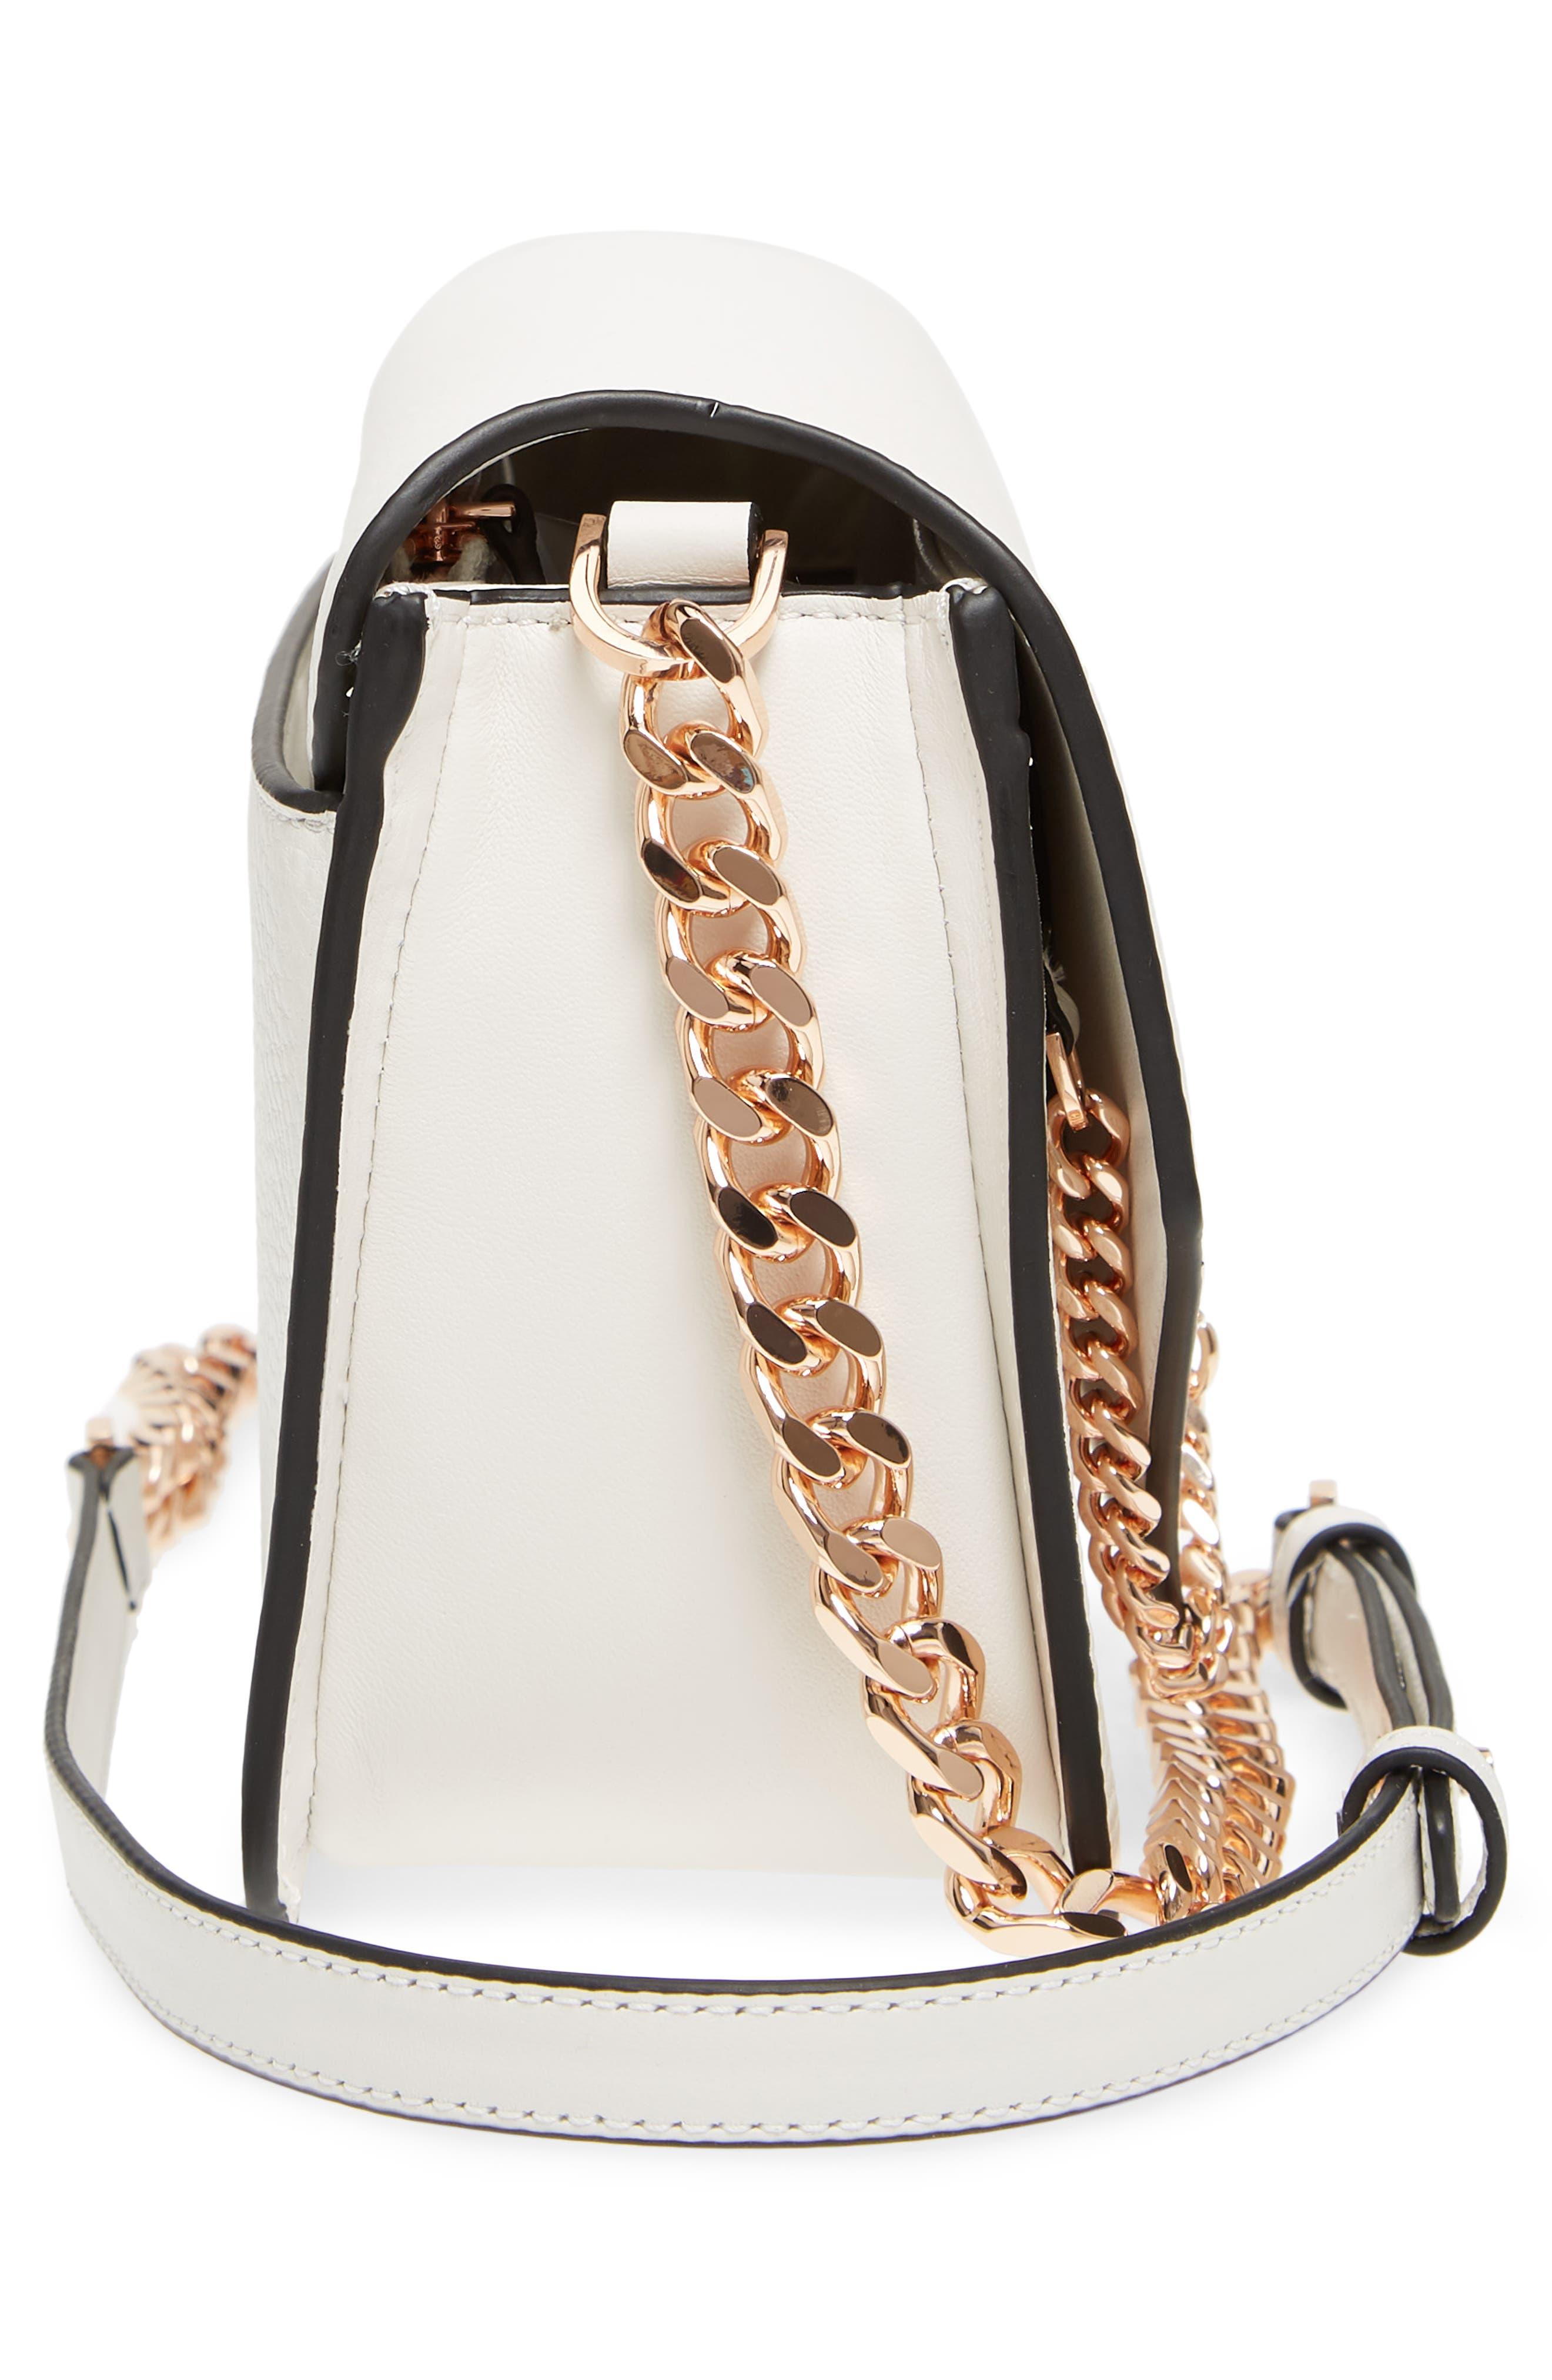 Cortney Nappa Leather Shoulder/Crossbody Bag,                             Alternate thumbnail 5, color,                             White/ Rose Gold